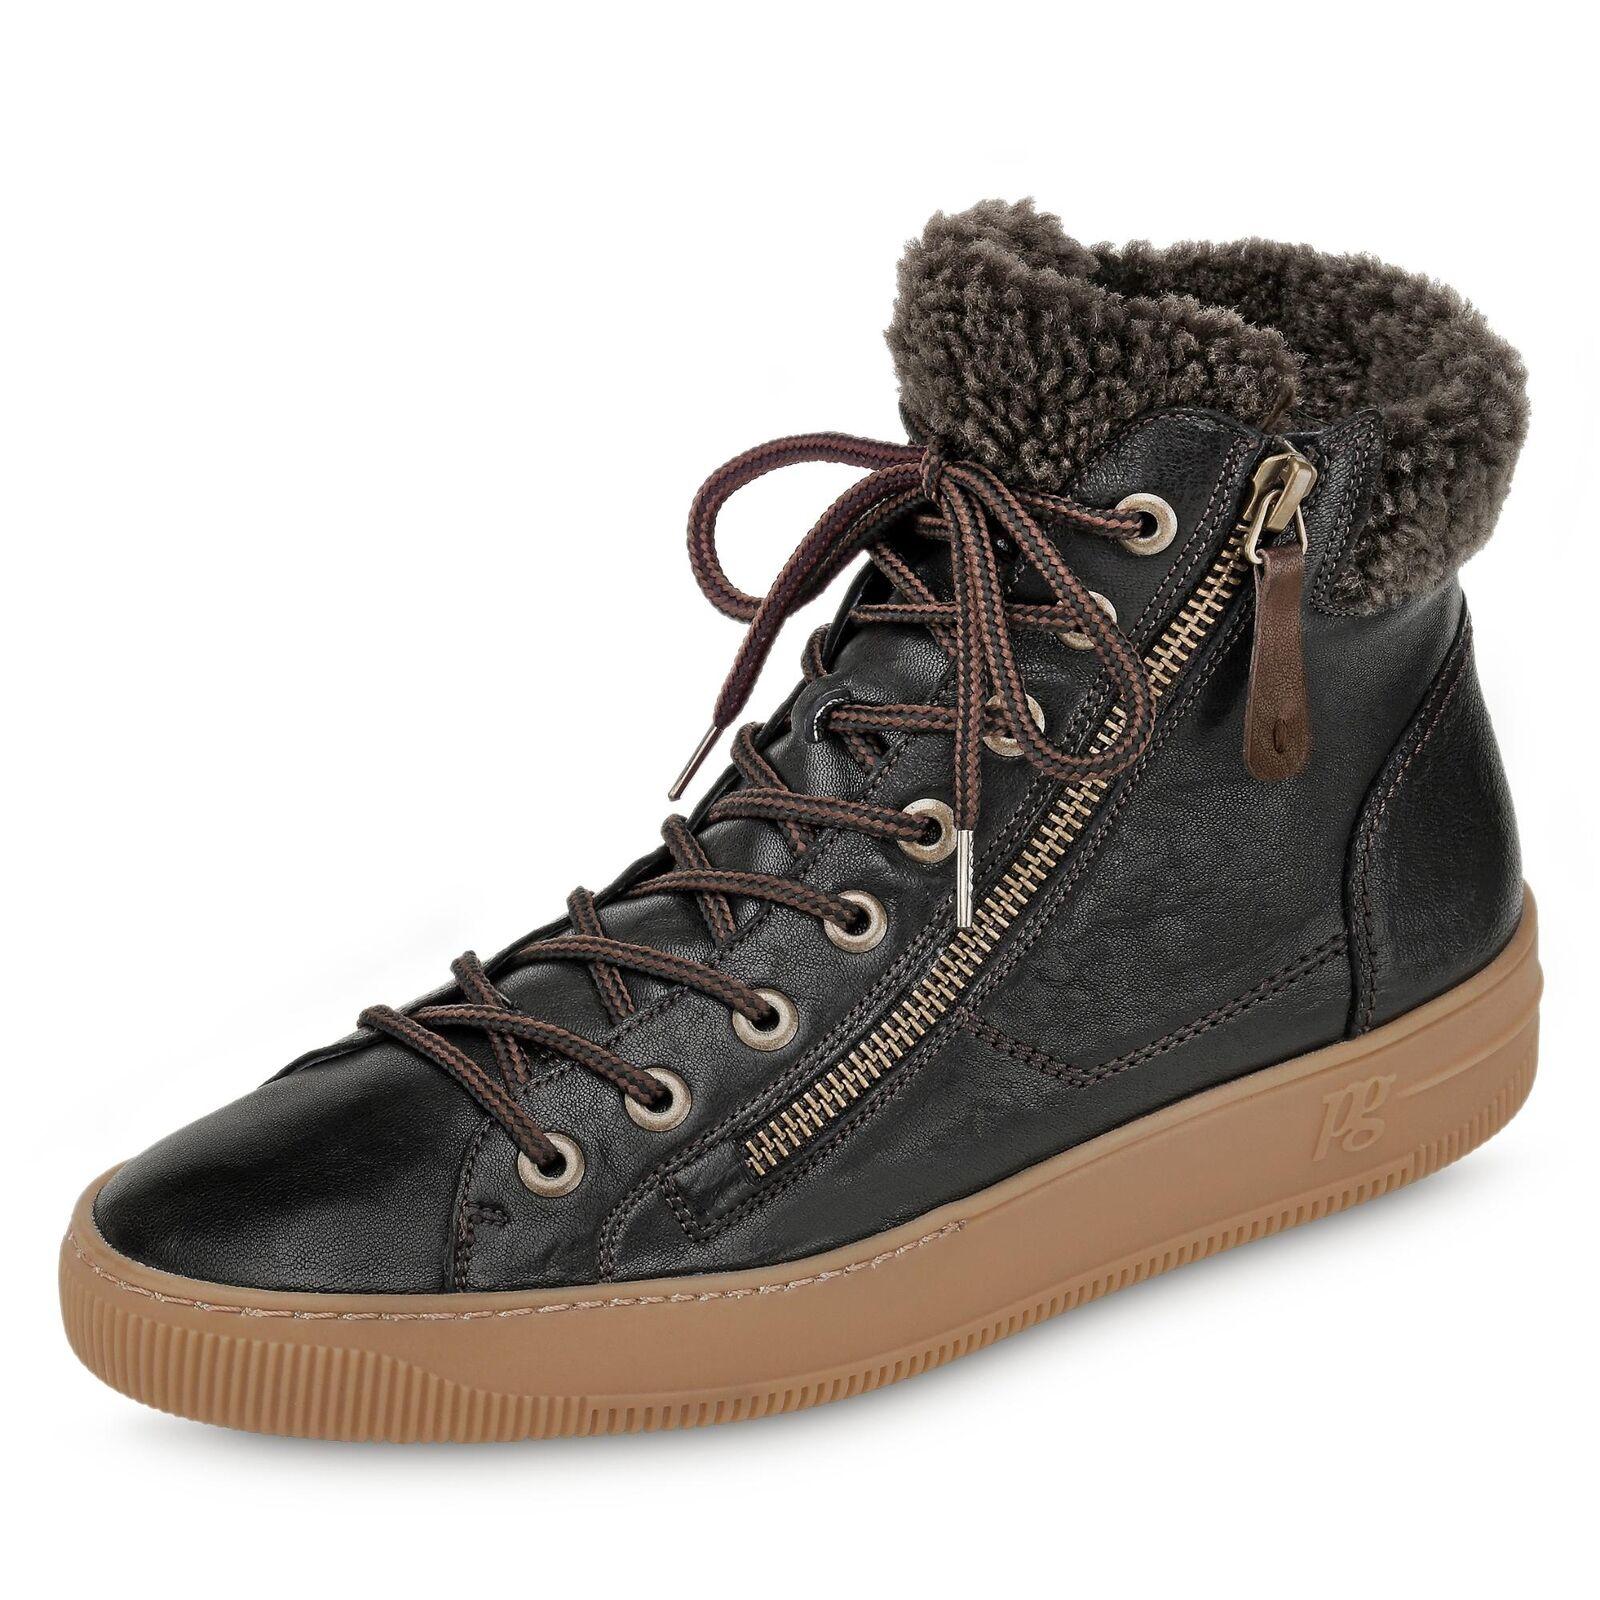 Josef Seibel Neele 16 85120-97513-540 Schuhe Slipper Damen Halbschuhe Sneaker